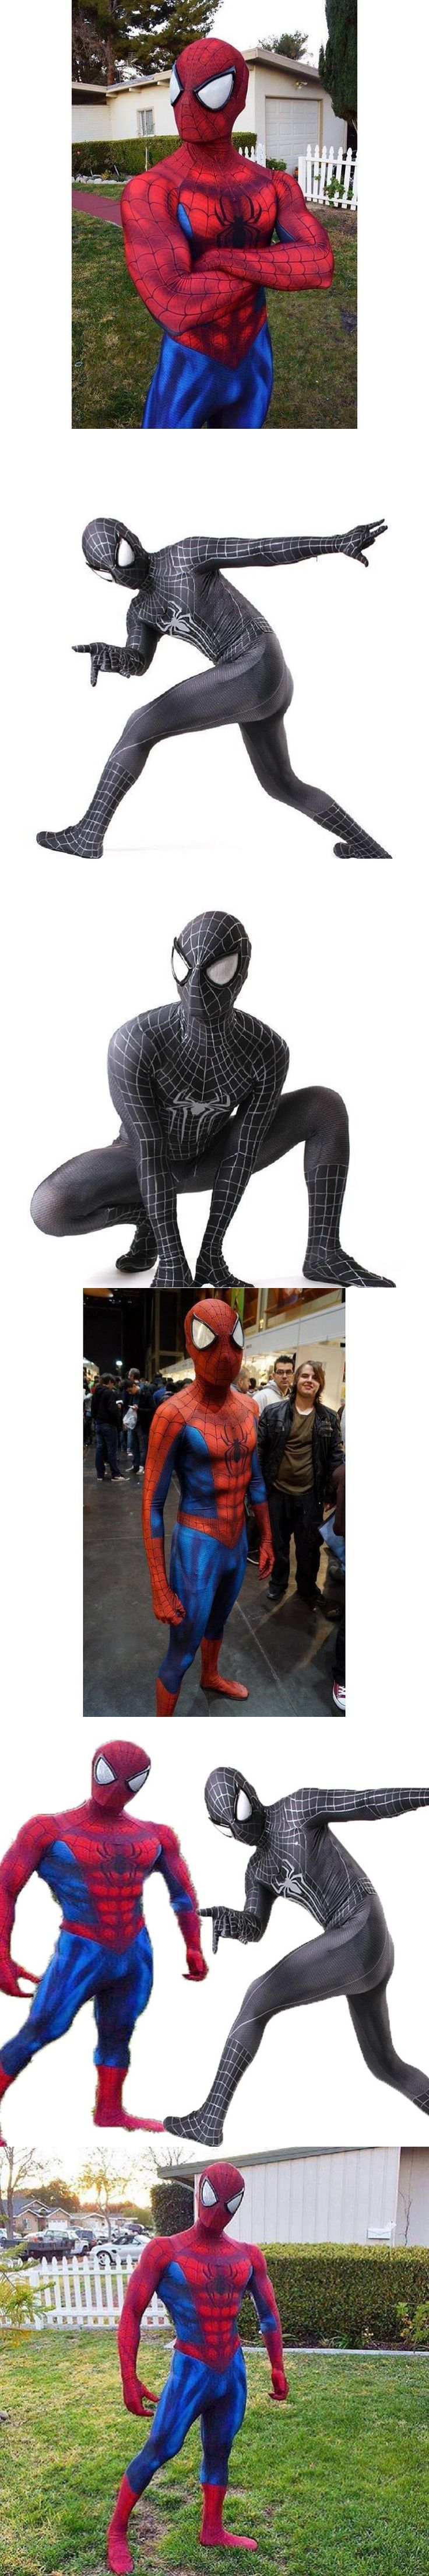 Spiderman Costume 3D Print Cosplay Zentai Suit Spandex Male Comic Spider-man Superhero Costume S-3XL